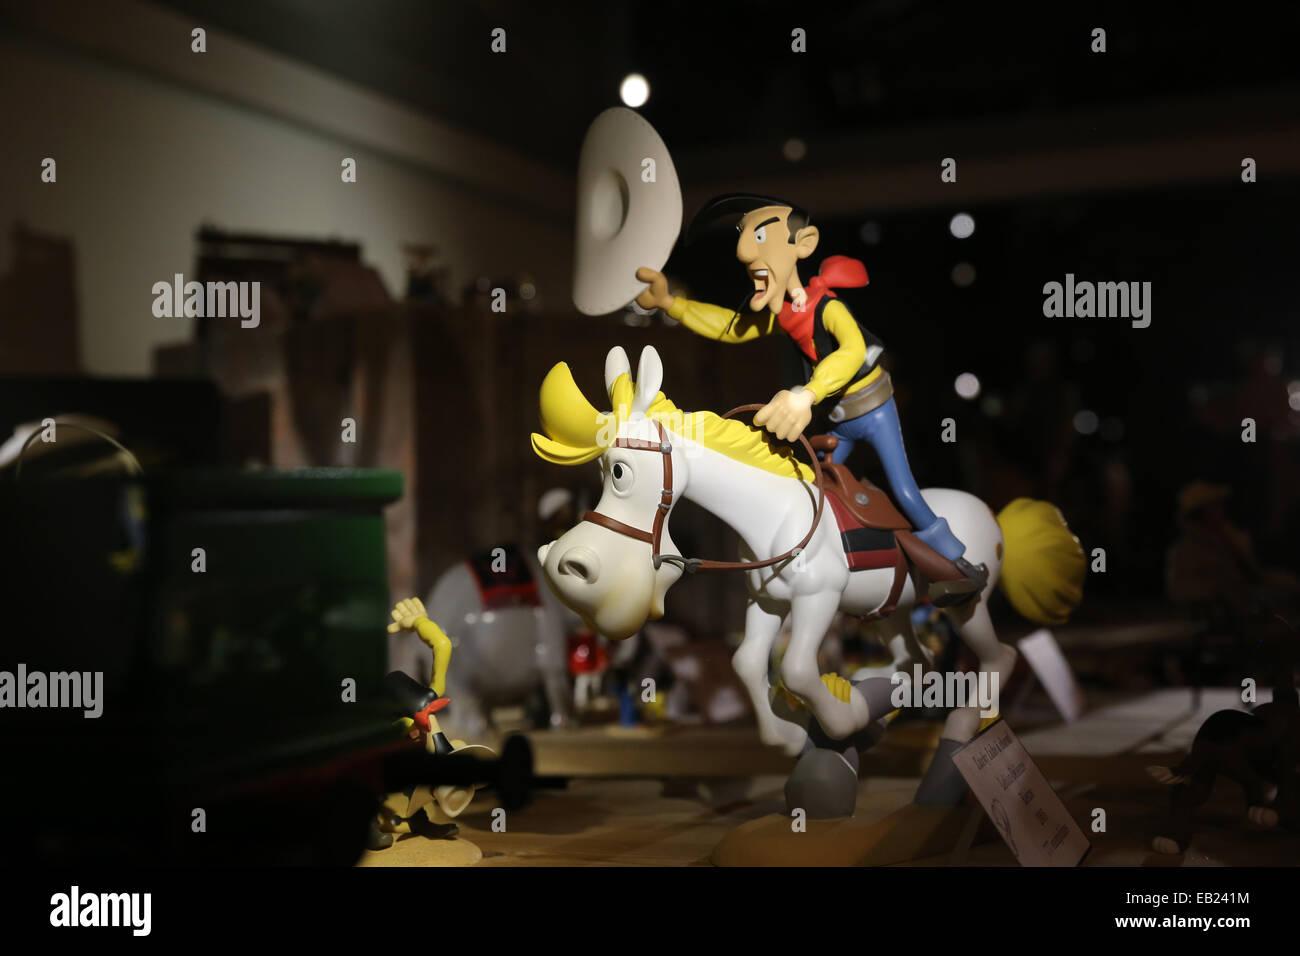 mini cowboy riding white horse figure - Stock Image